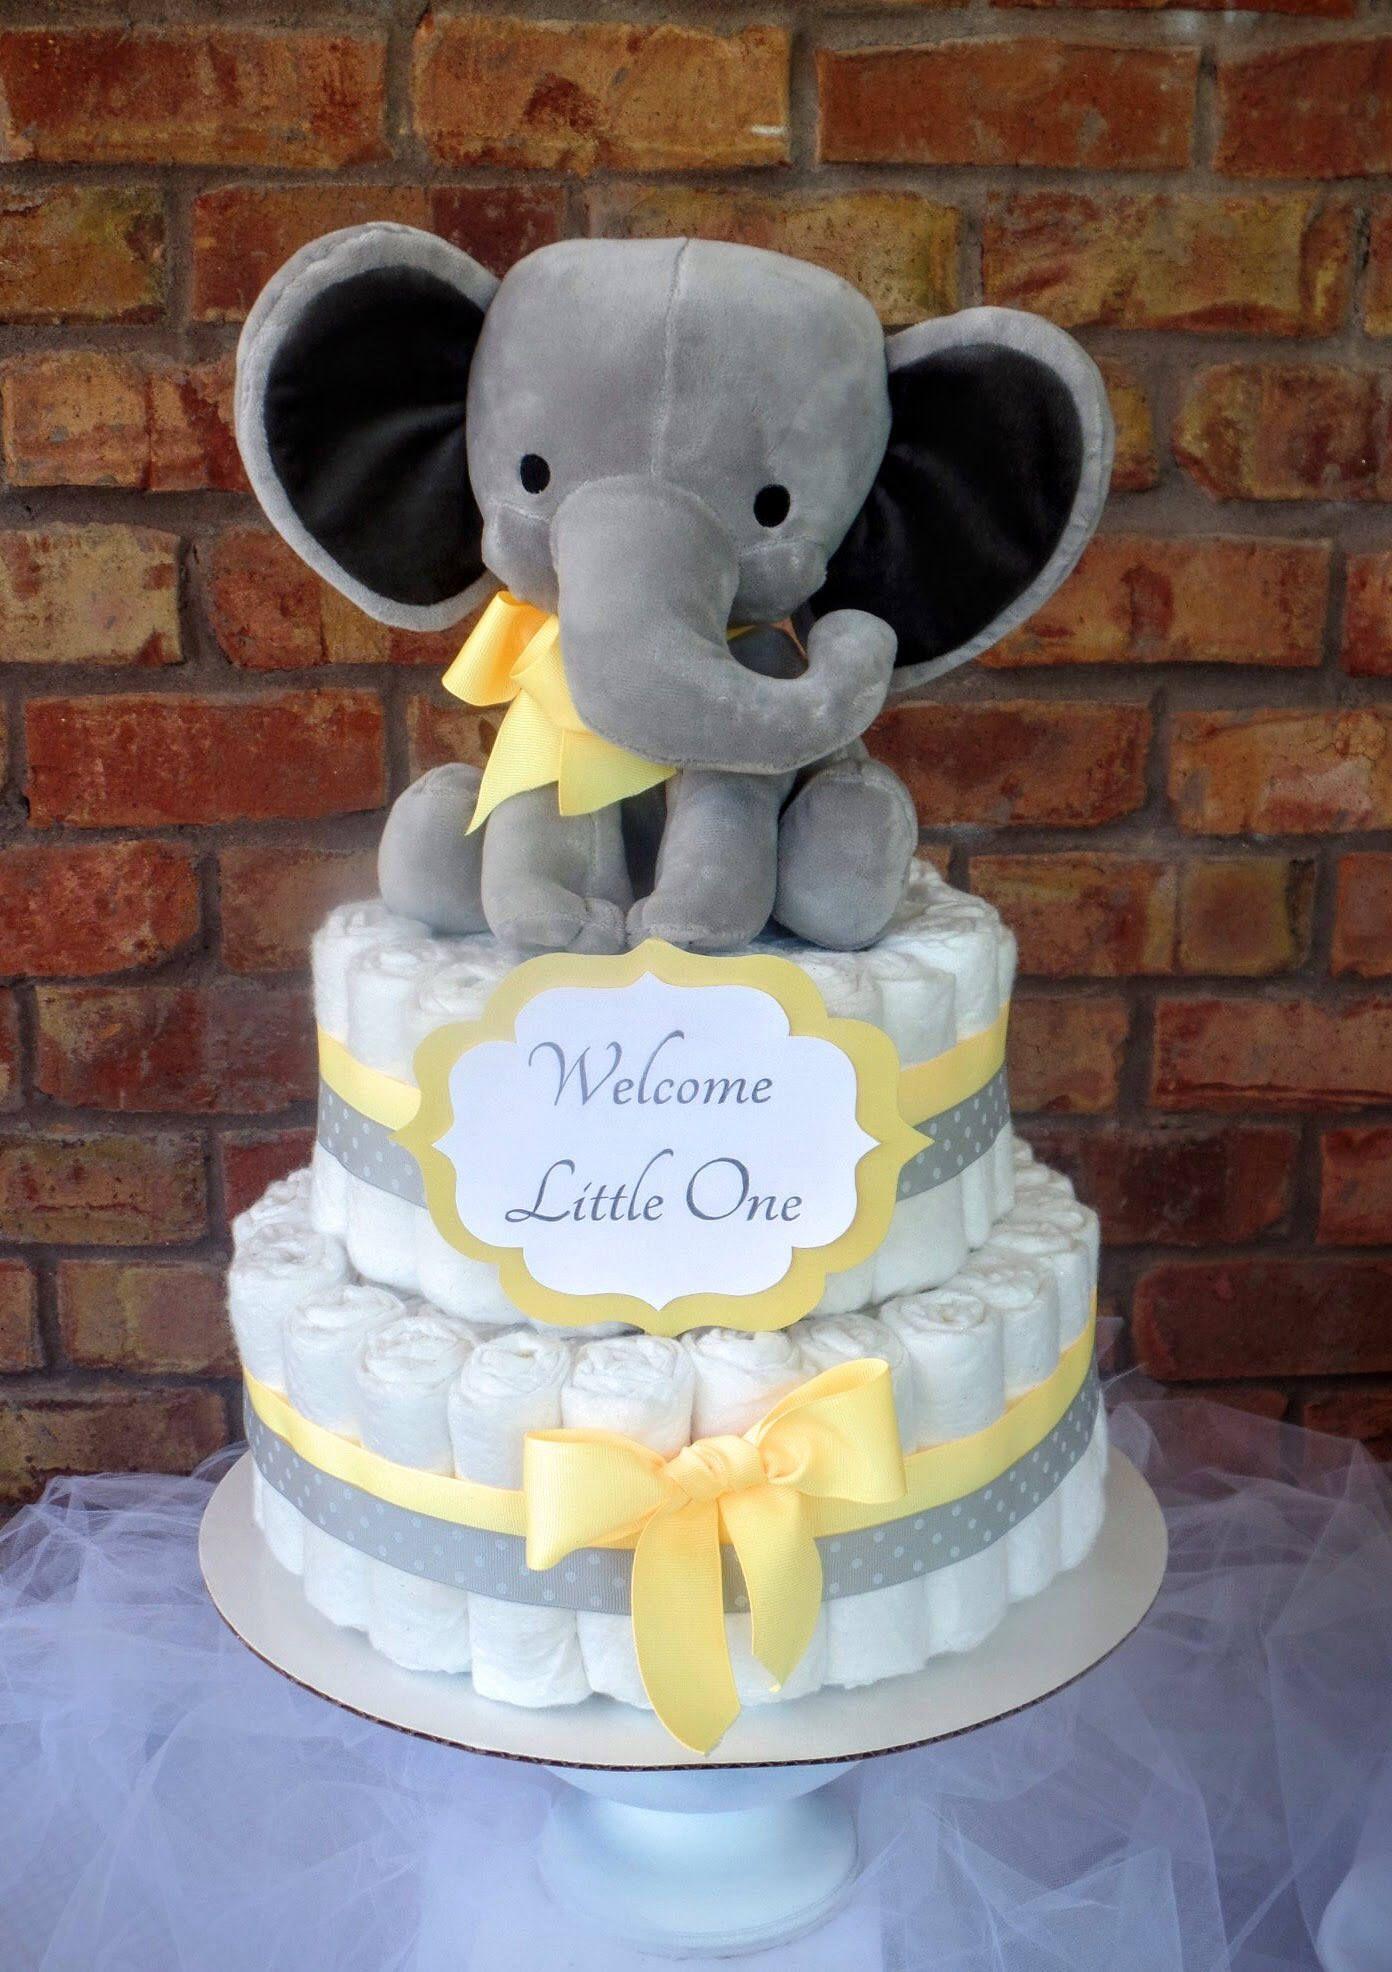 Elephant Diaper Cake Diaper Cake Baby Shower Decoration Yellow Diaper Cake Girl Diaper Cake Boy Diaper Cake Elephant Diaper Cakes Diaper Cake Boy Elephant Baby Shower Centerpieces